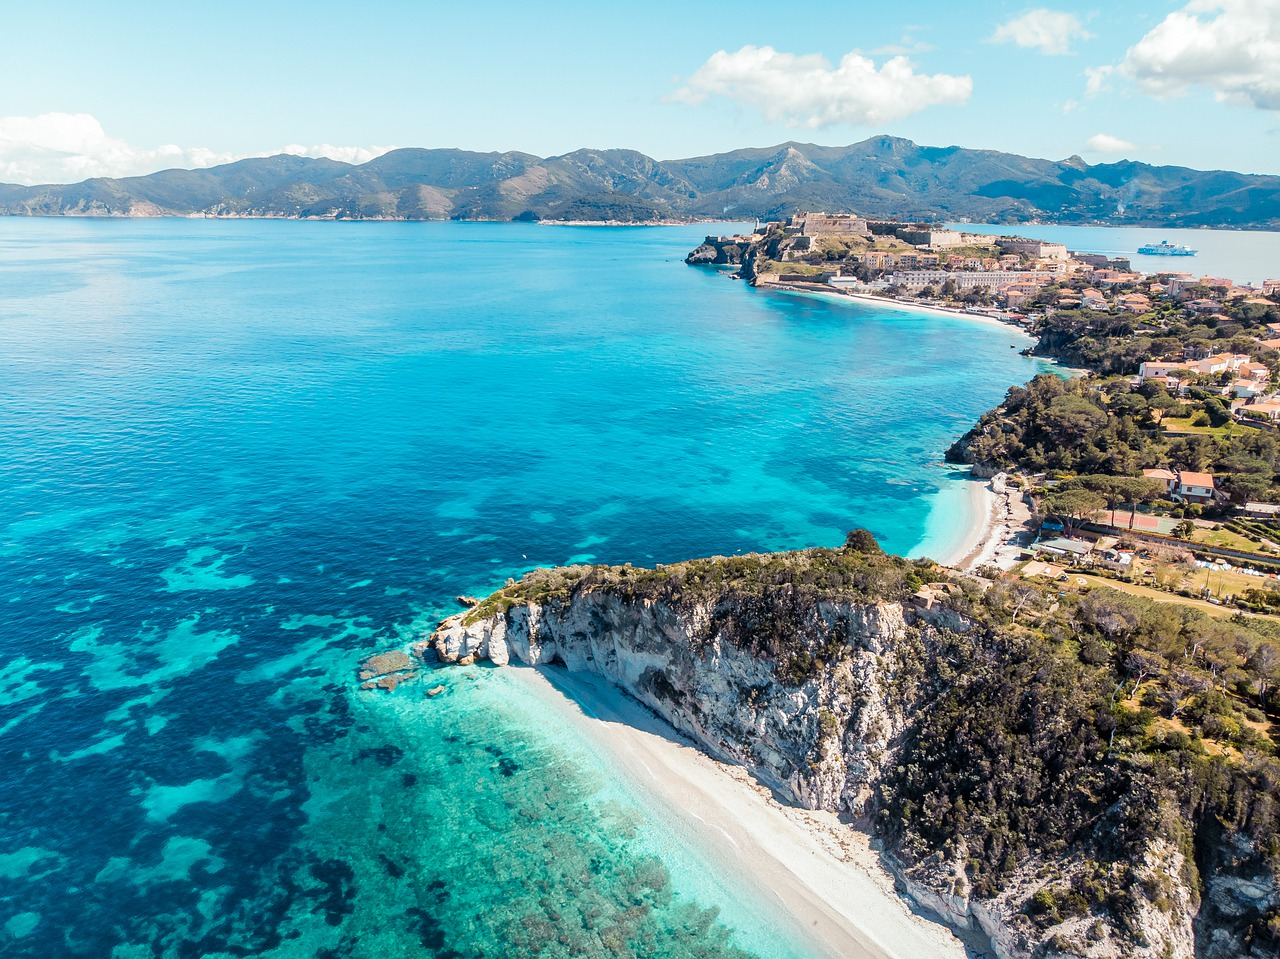 Isola d'Elba – Tra cucina tipica e passeggiate all'aria aperta